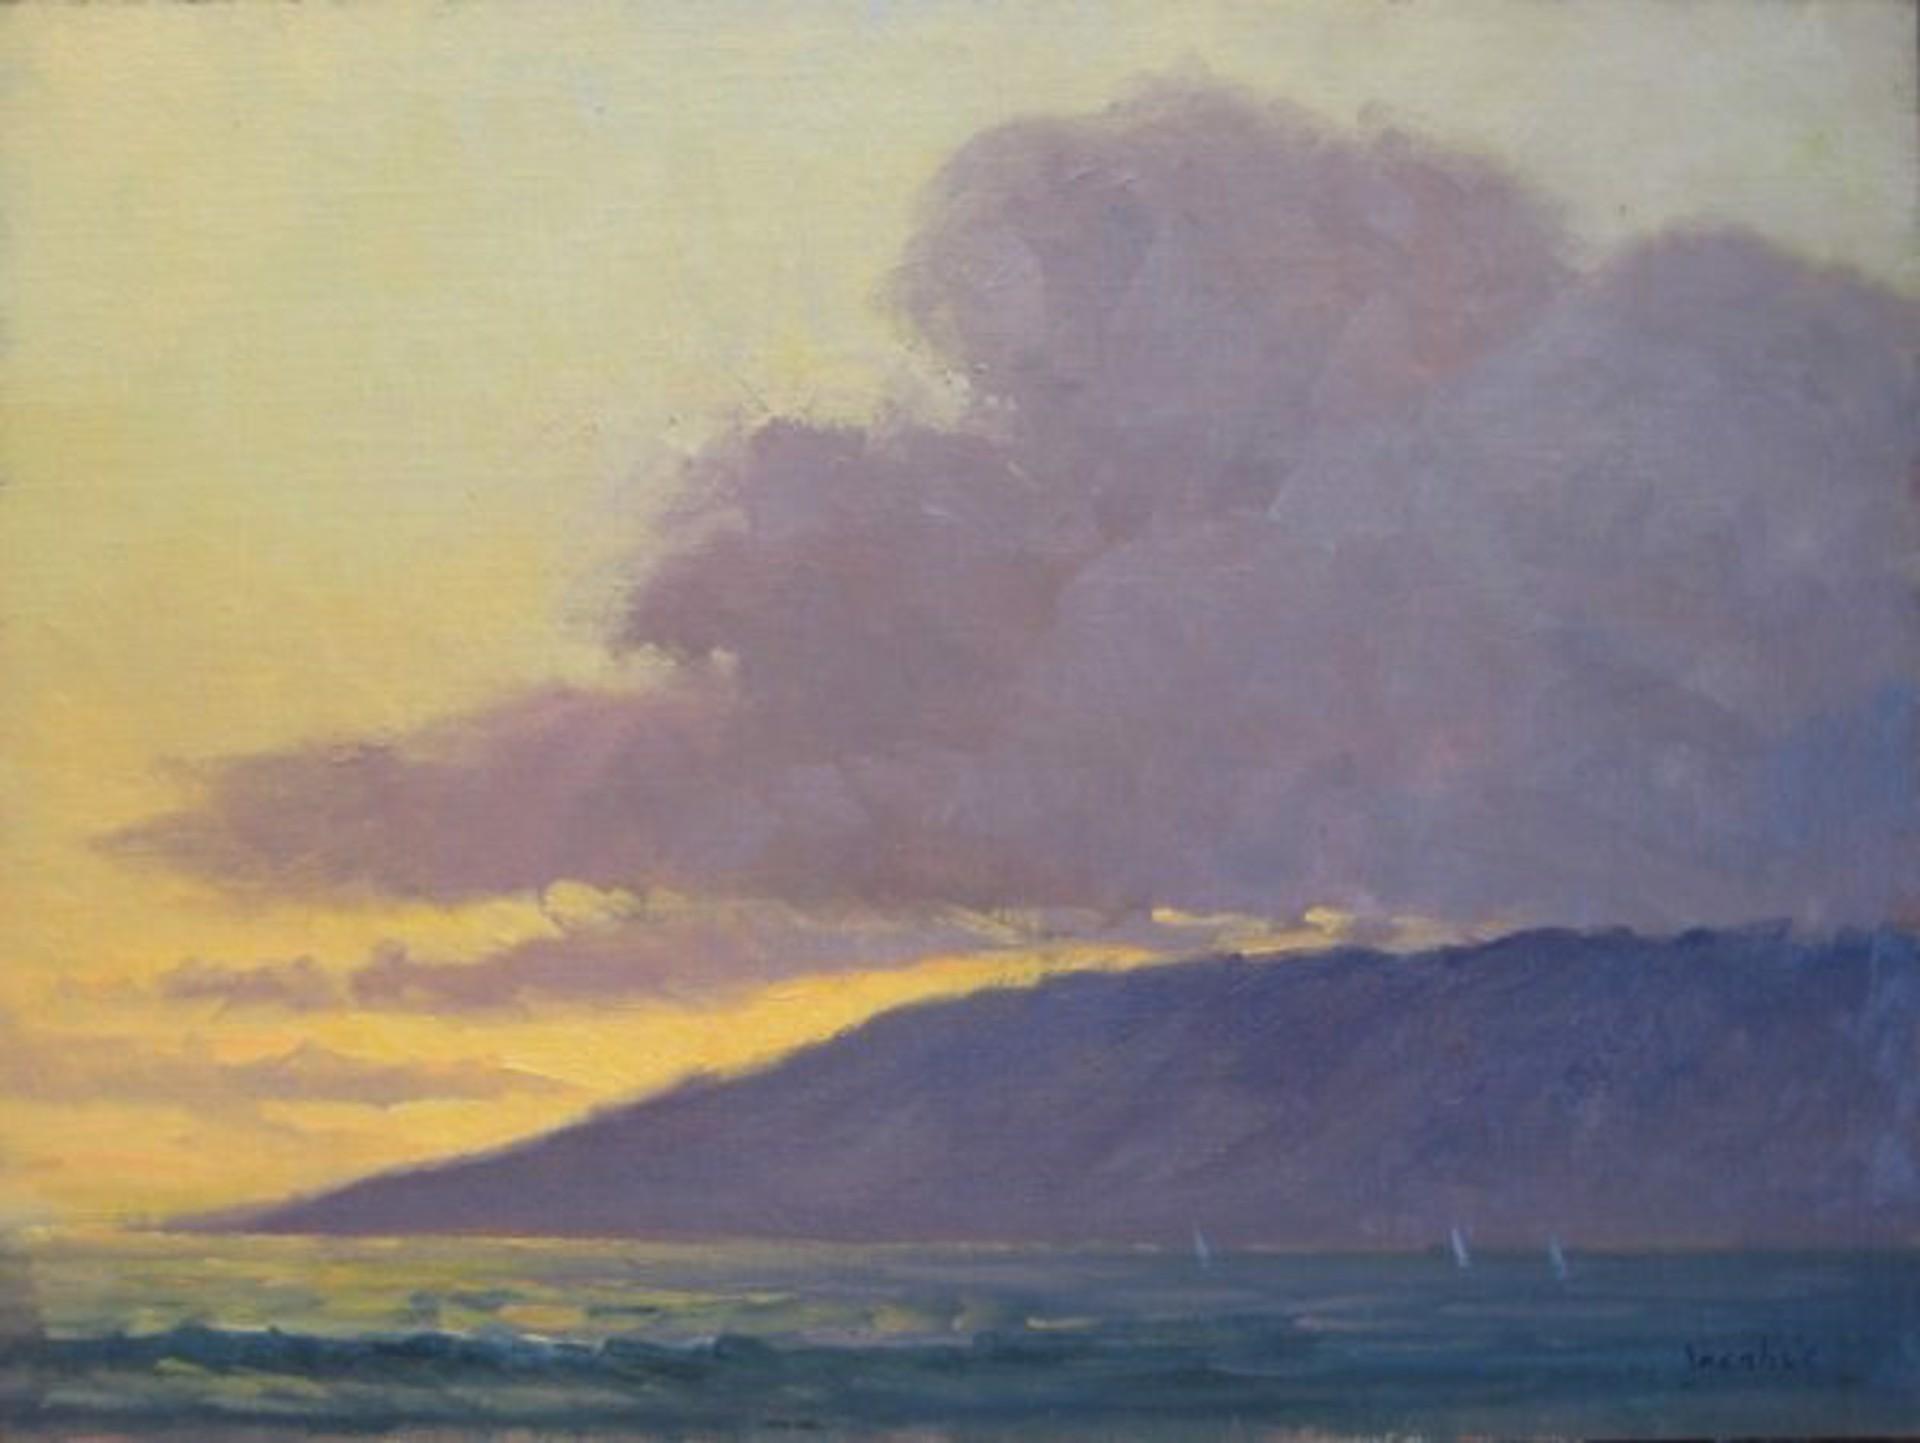 Jacobus: Sunset Clouds Over Lanai by Jacobus Baas